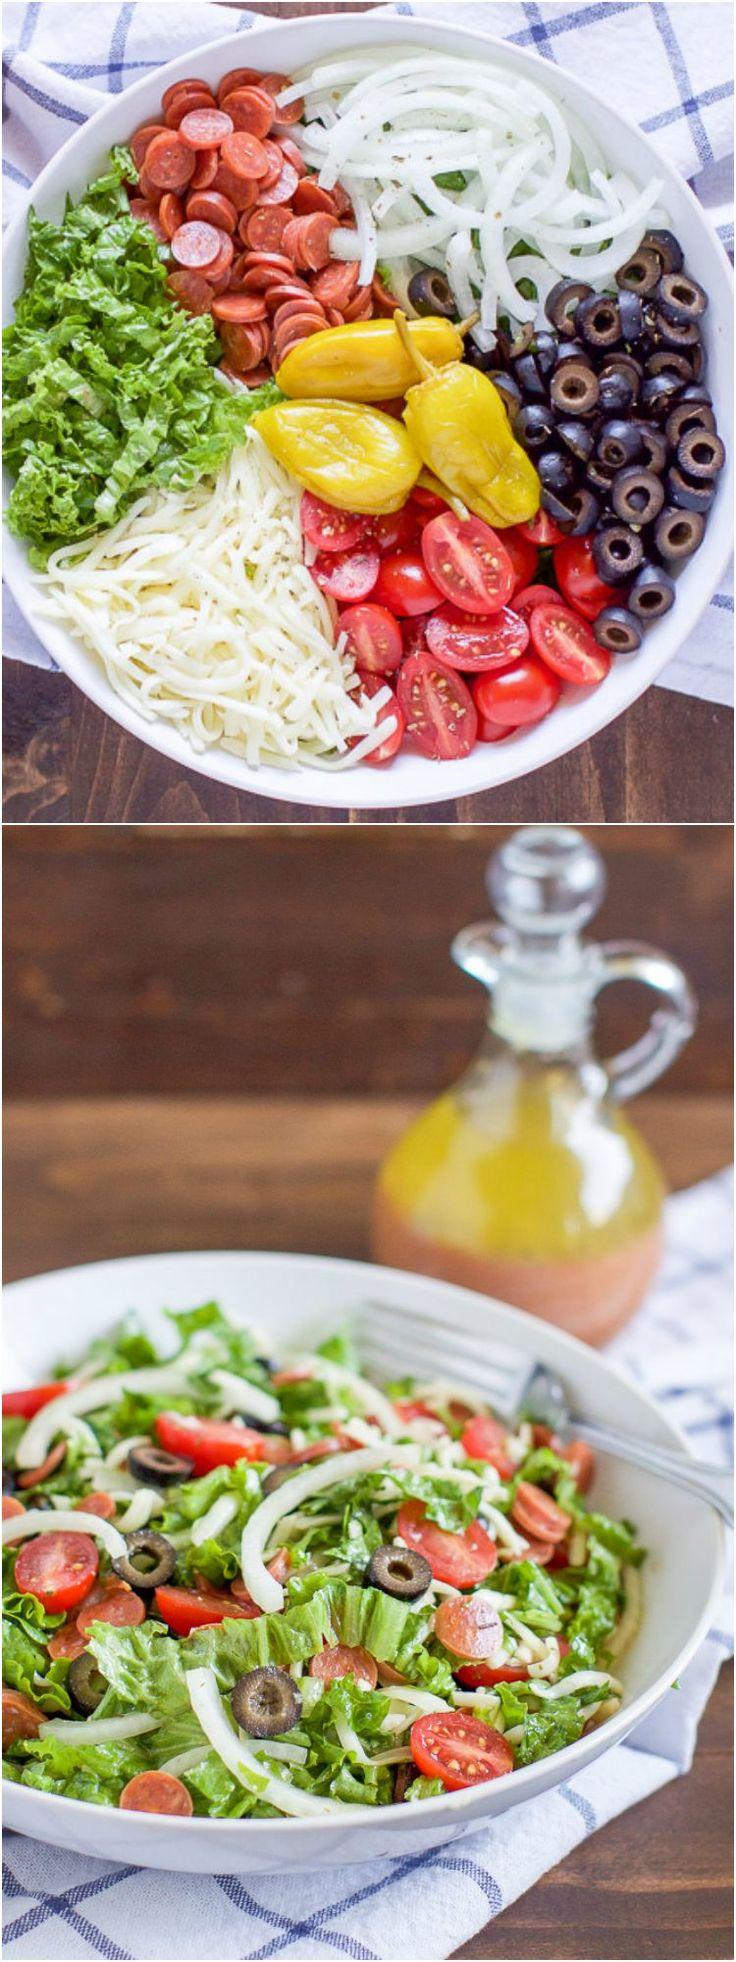 Slow Cooker: Italian Antipasto Salad